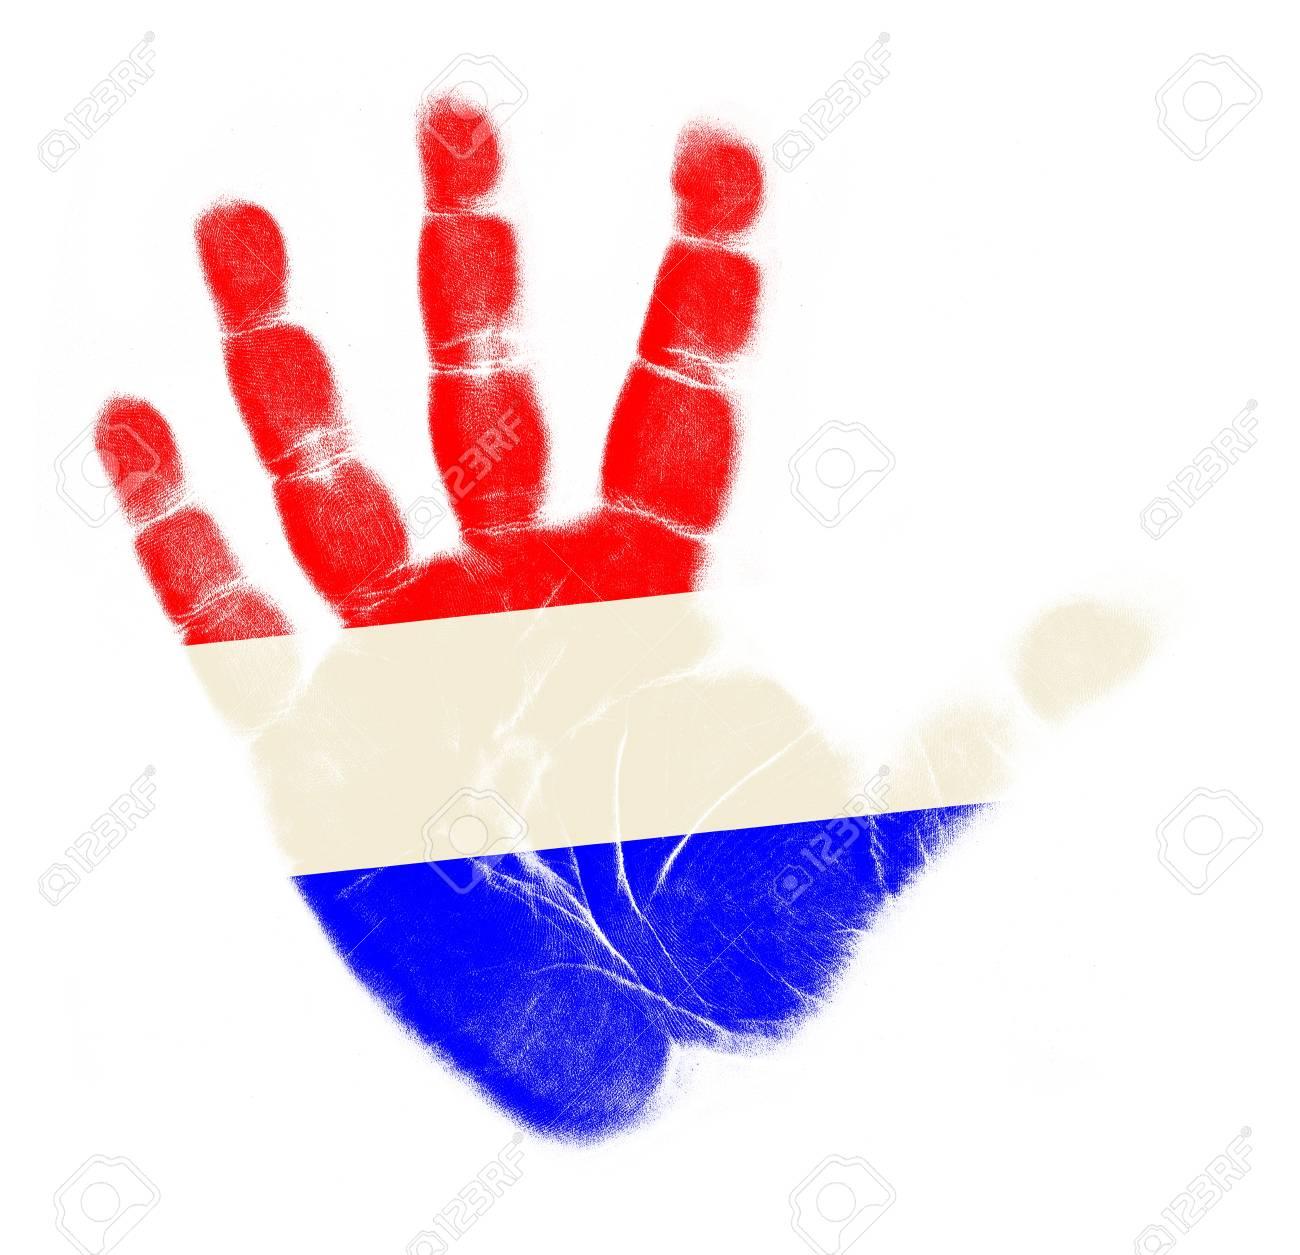 Netherlands flag palm print isolated on white background Stock Photo - 12661206